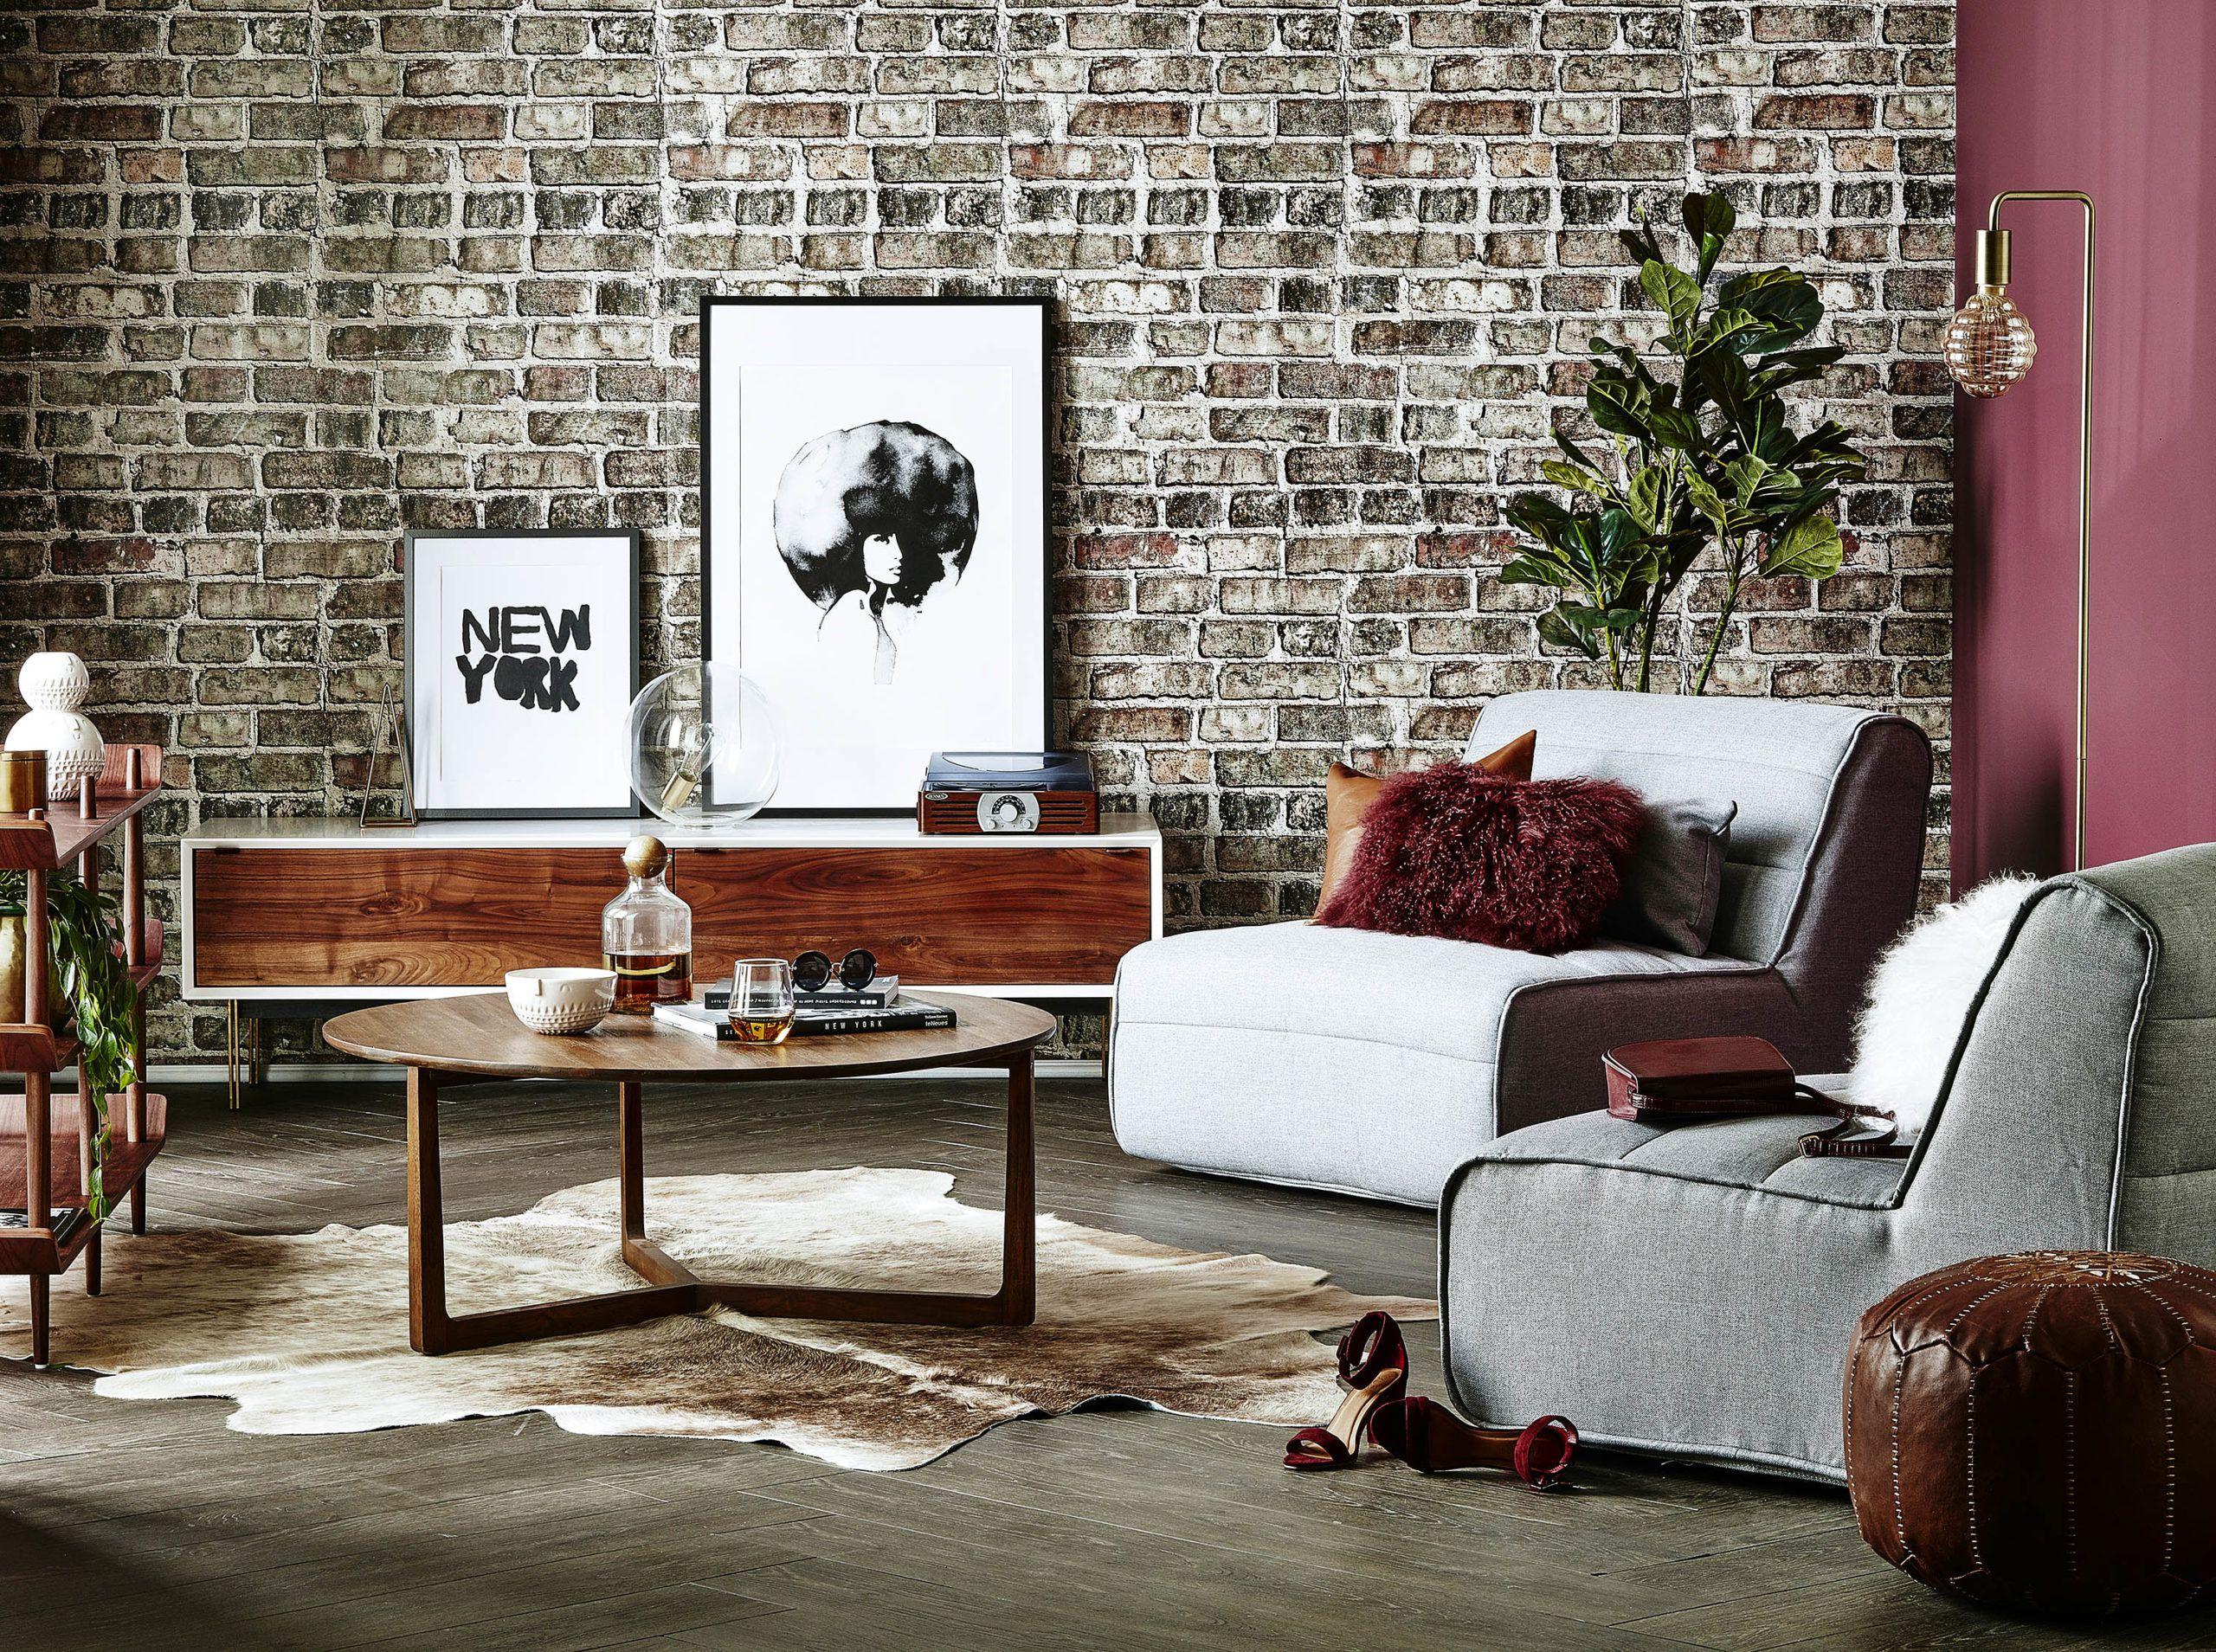 Vintage Brick Wallpaper • Urban Loft • Shabby Chic